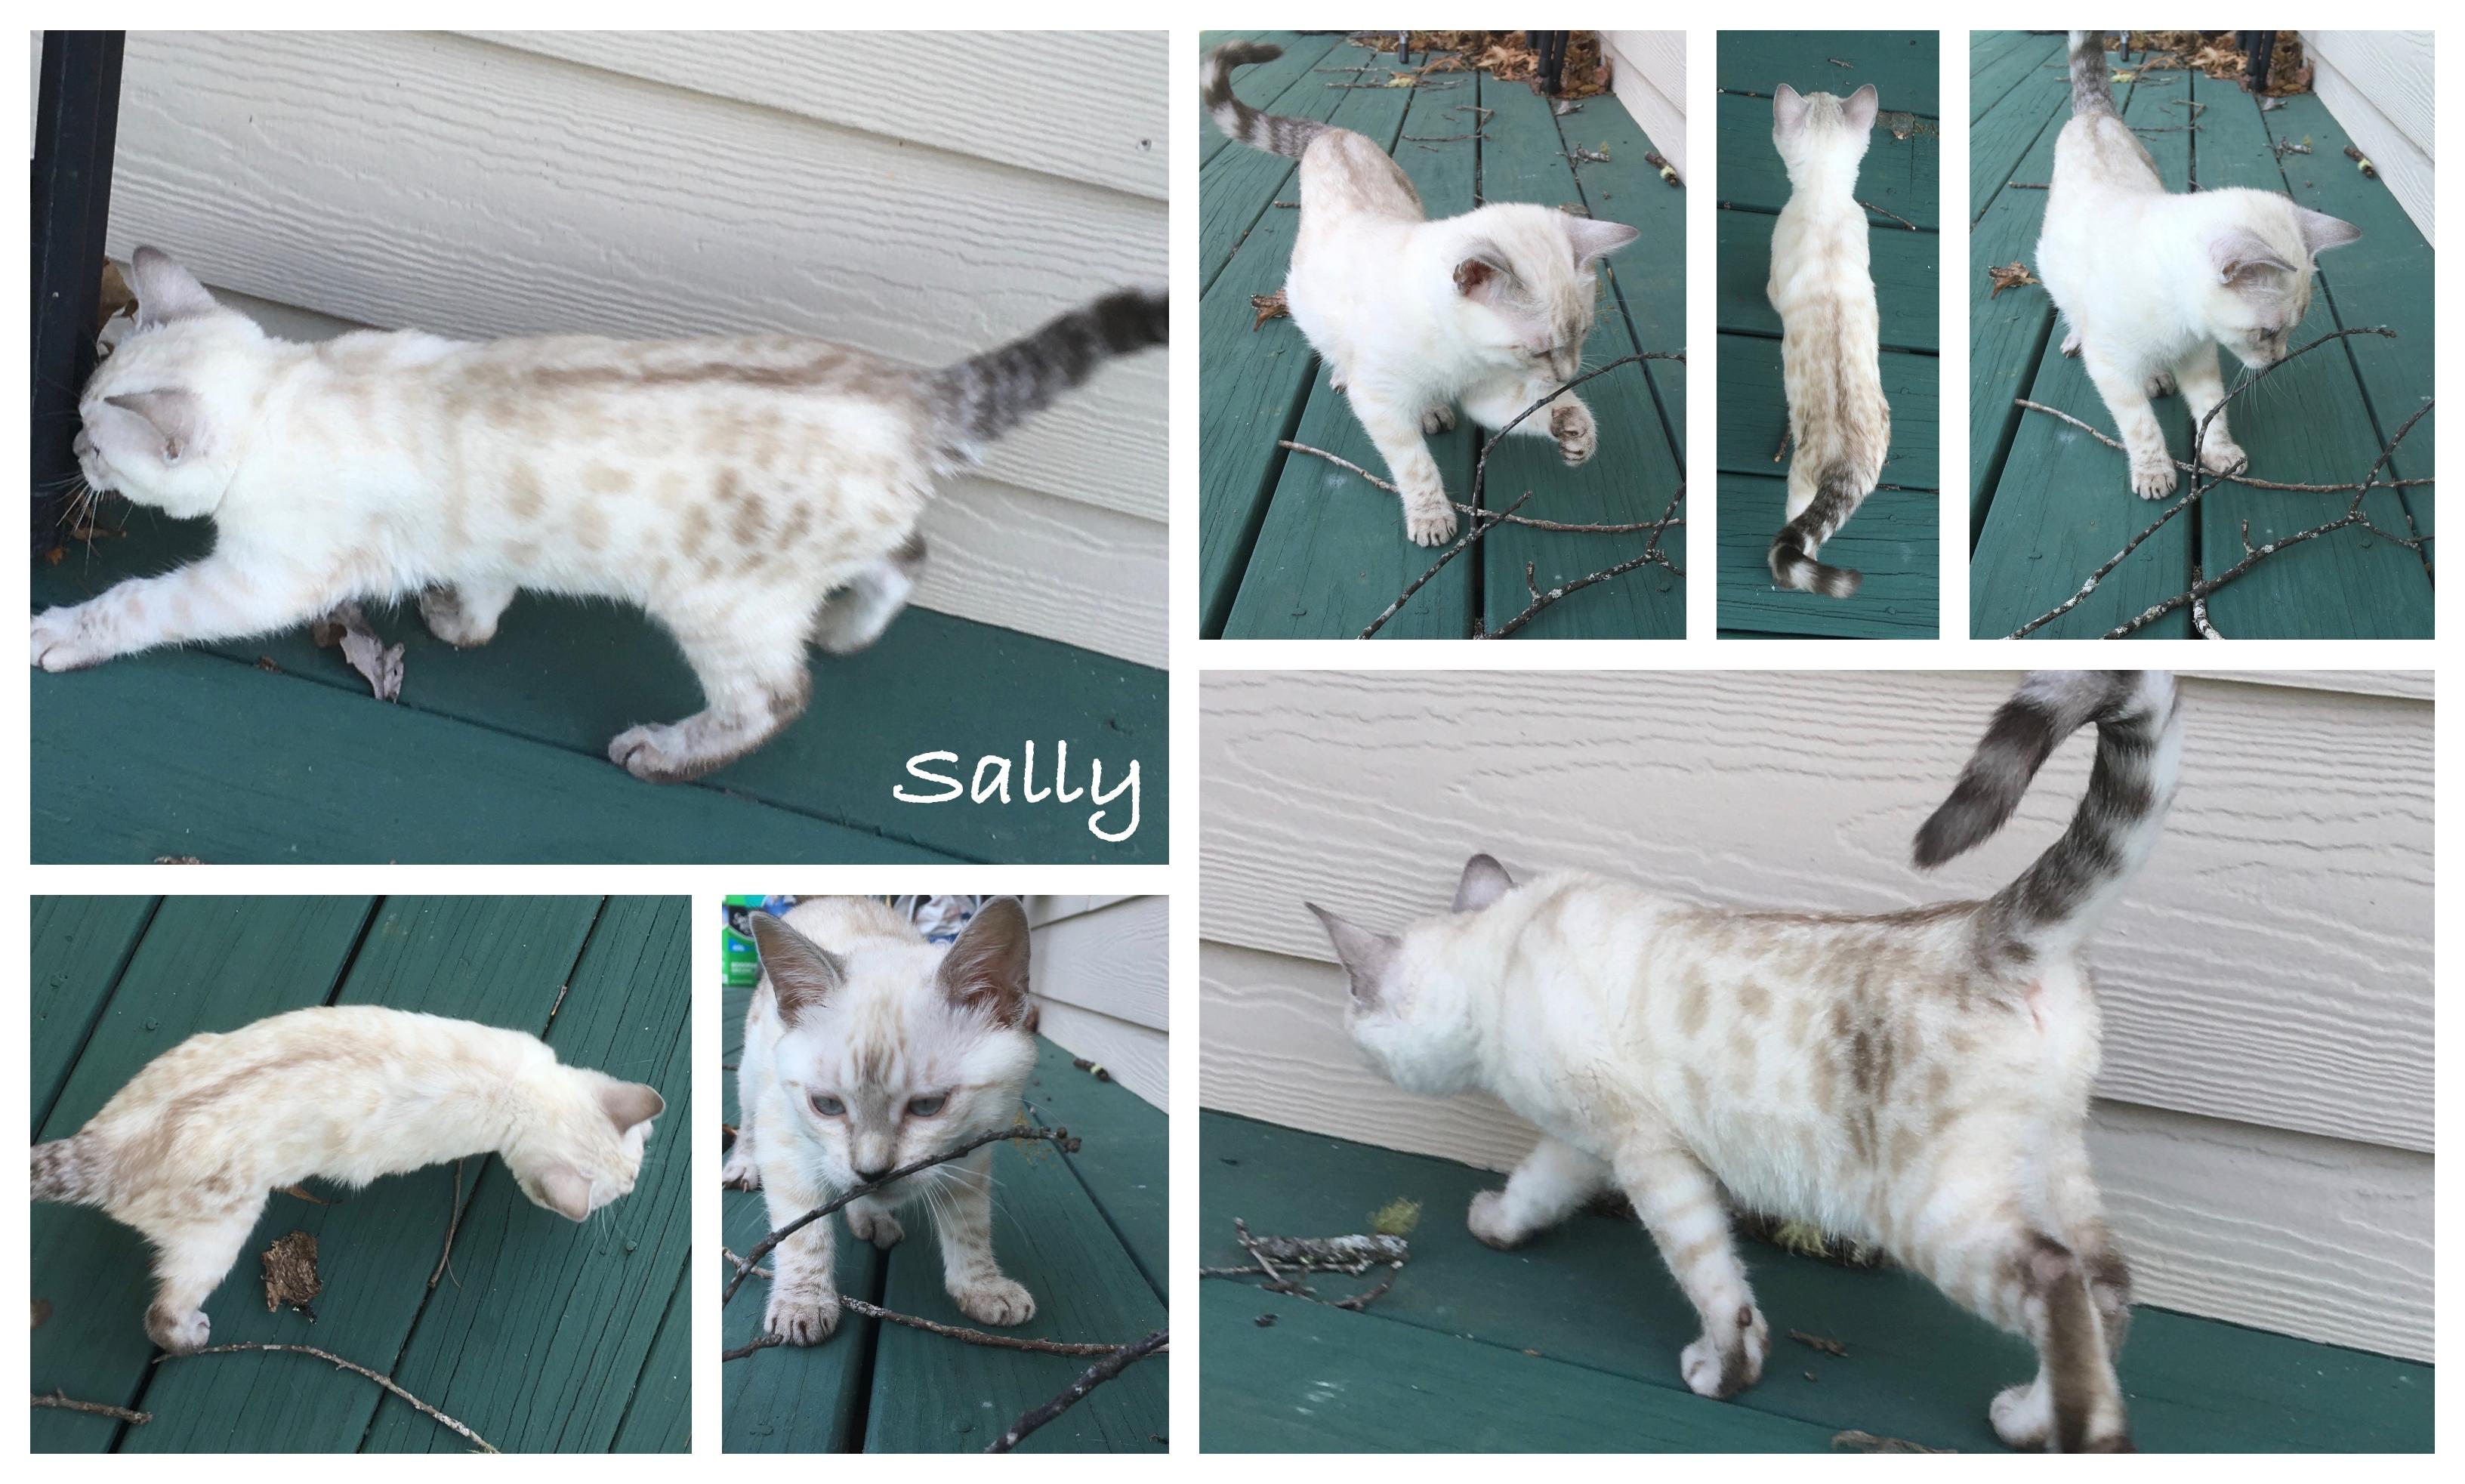 Sally 13 weeks